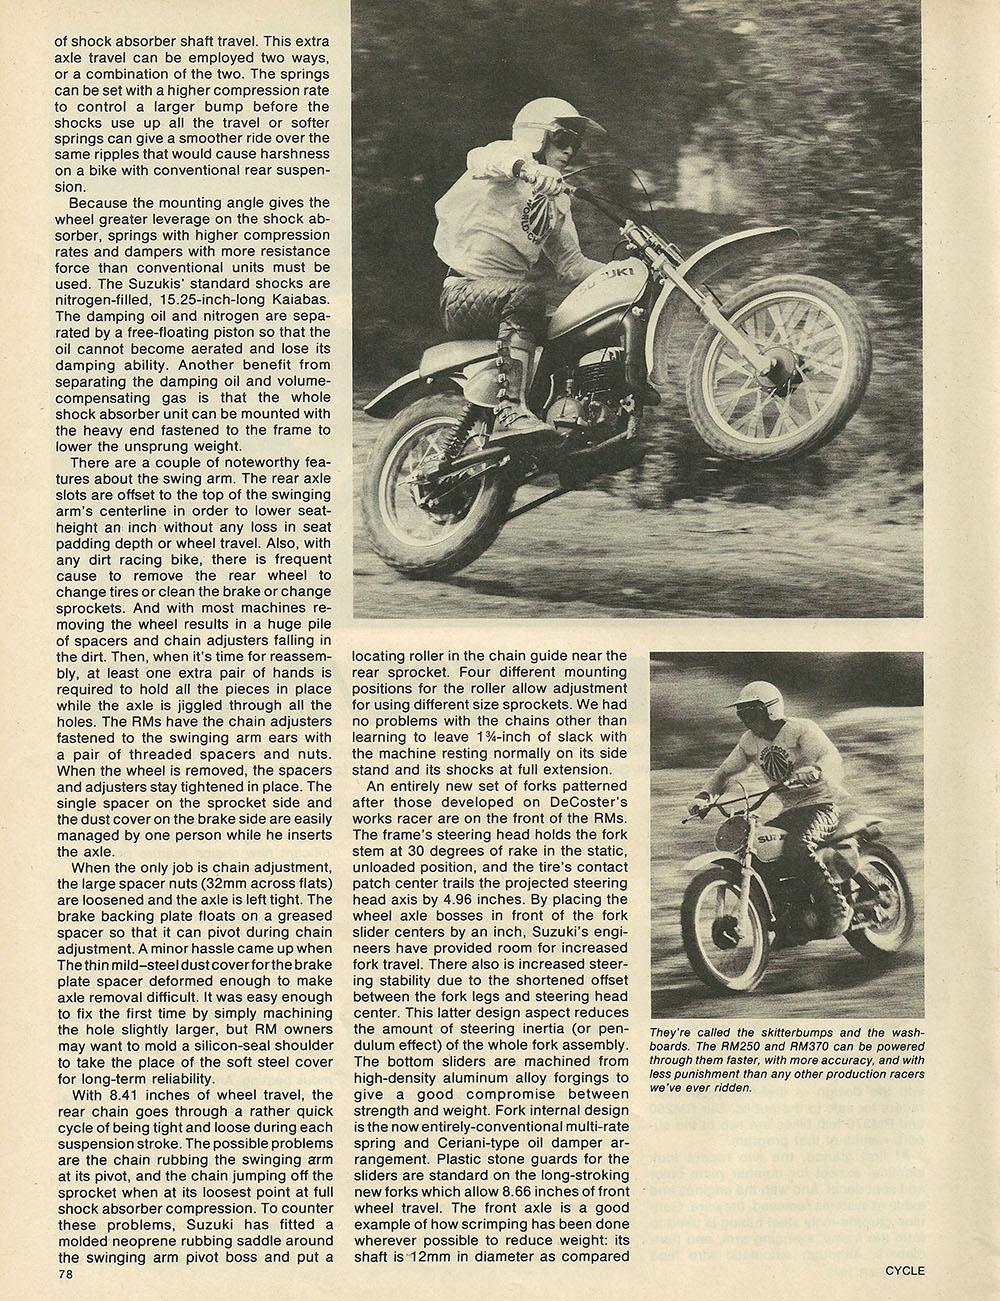 1975 Suzuki RM250 and RM370 off road test 2.JPG